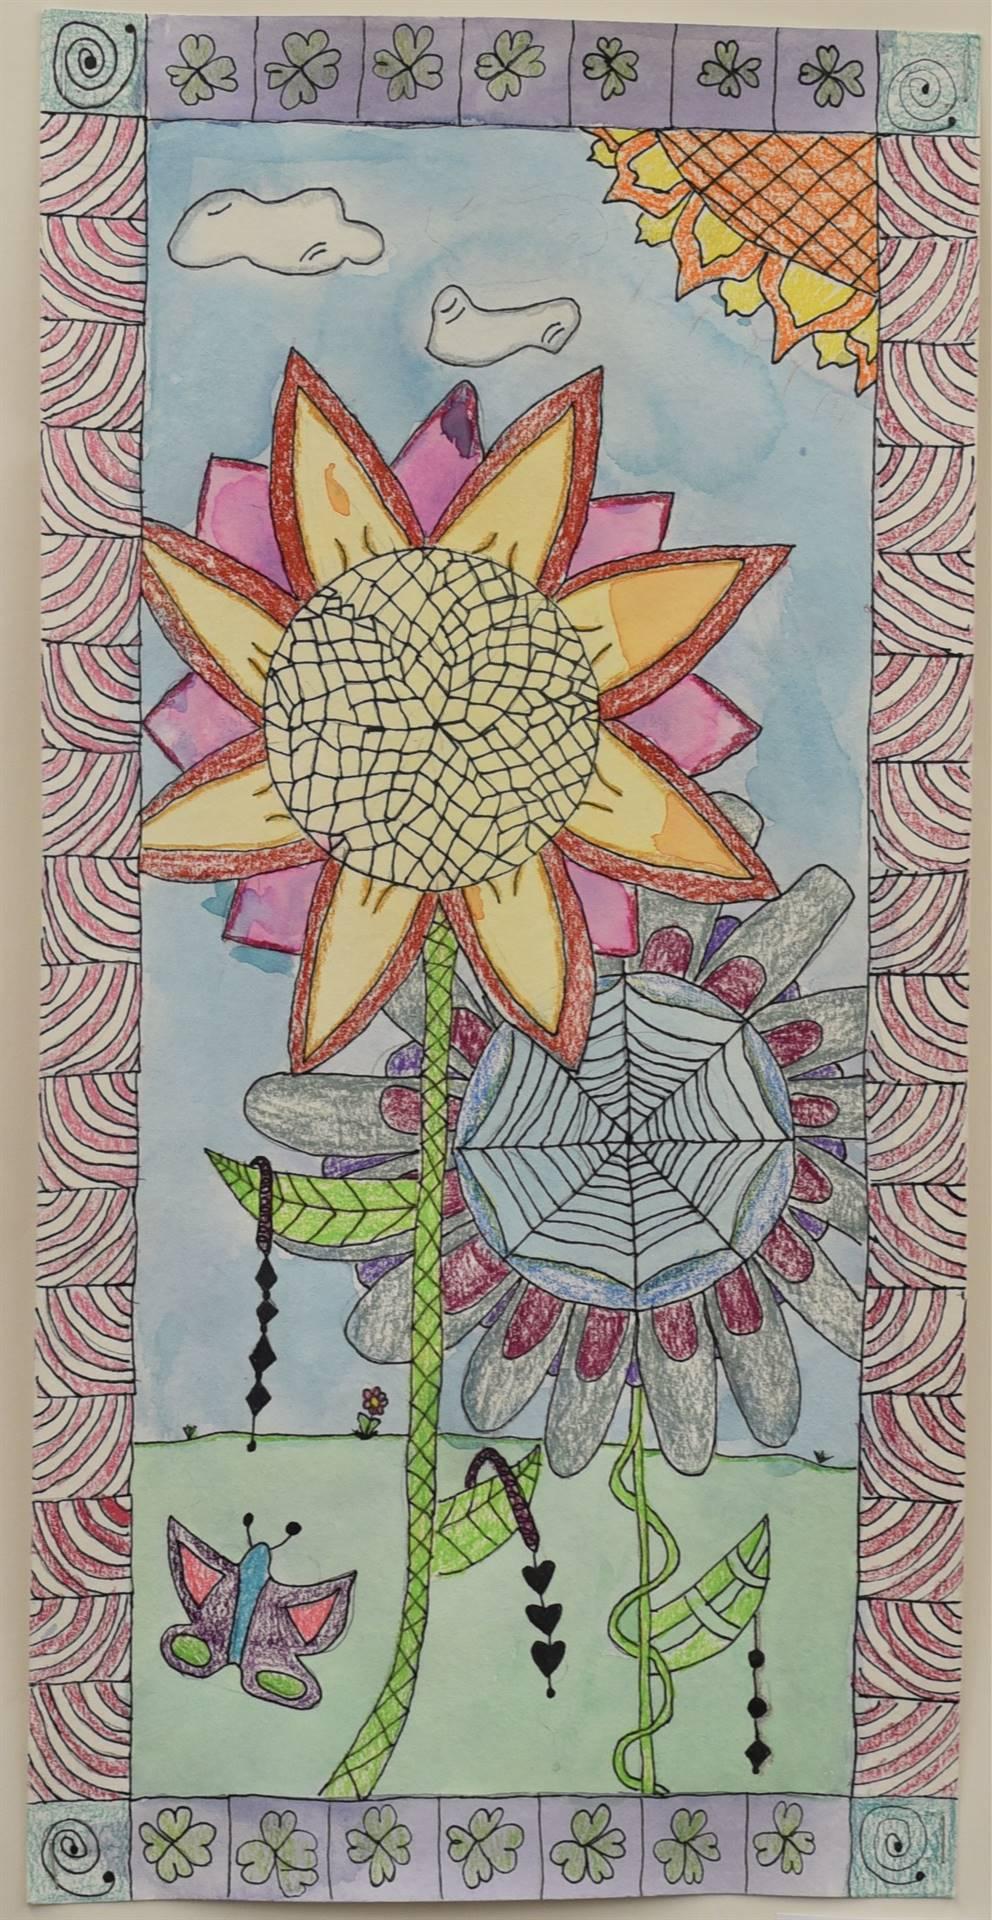 Brecksville-Broadview Hts. Middle School Art Projects 161